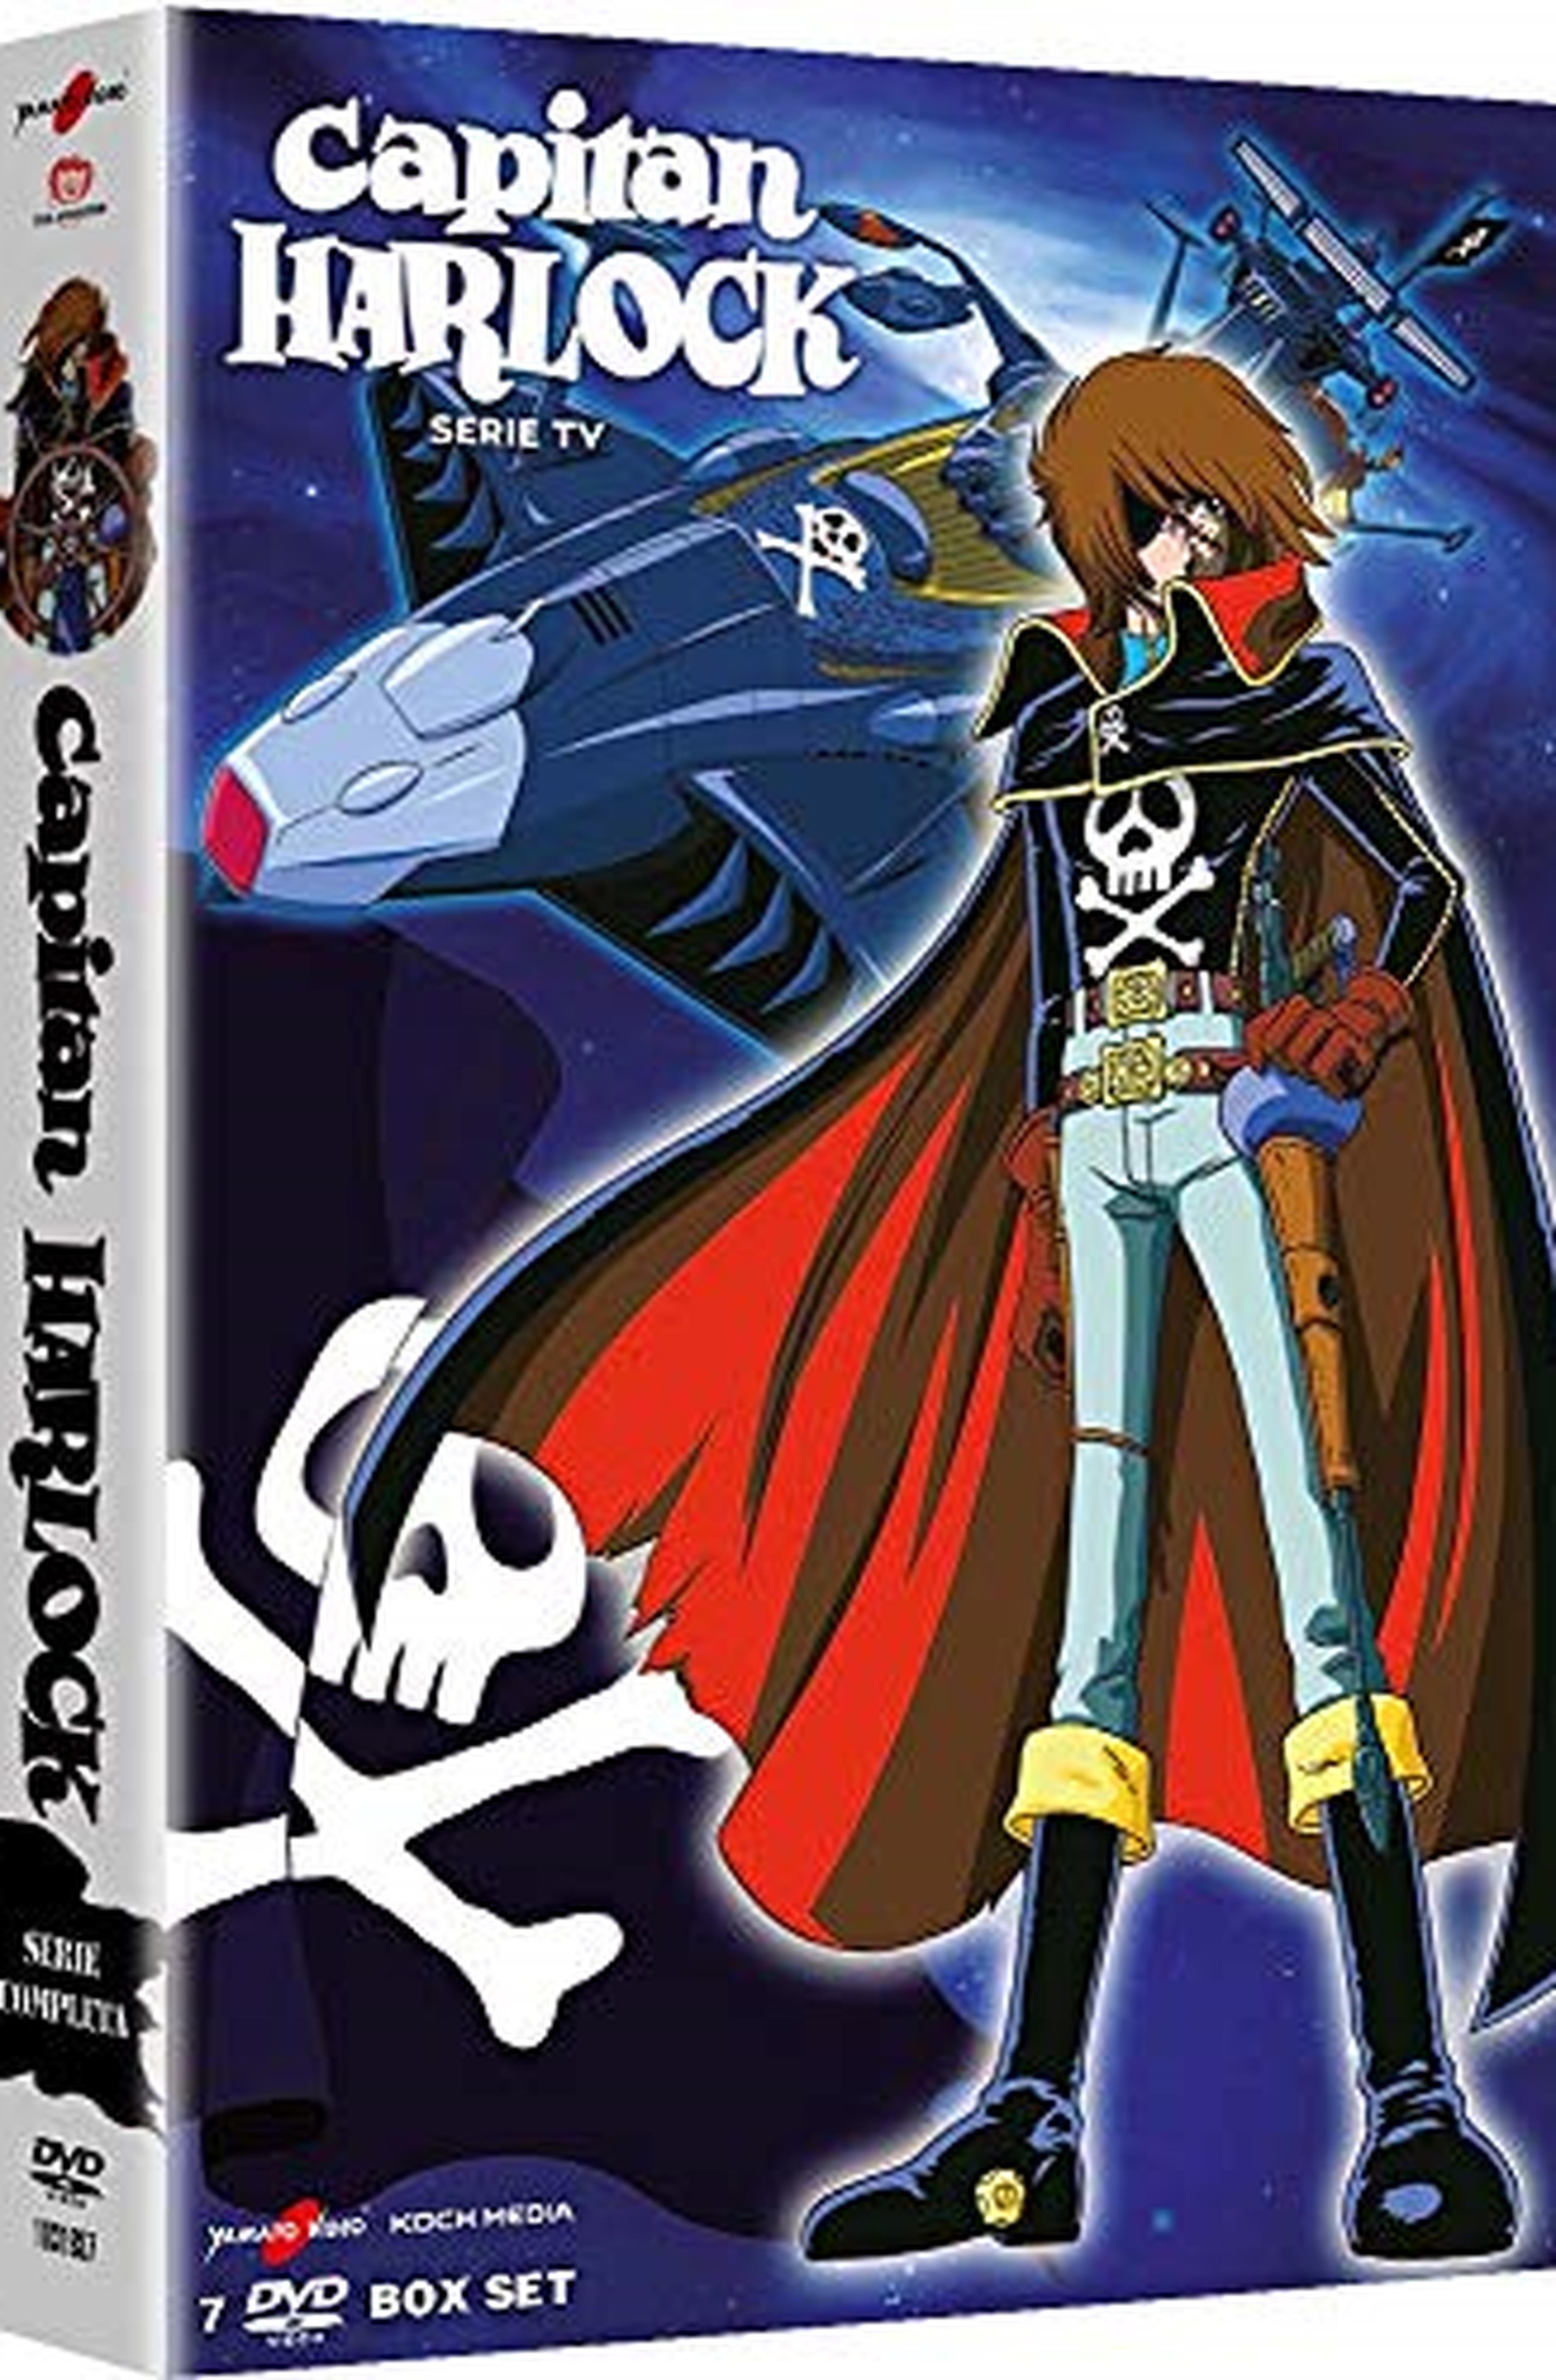 Capitan Harlock - La Serie Completa (Collectors Edition) (7 DVD)